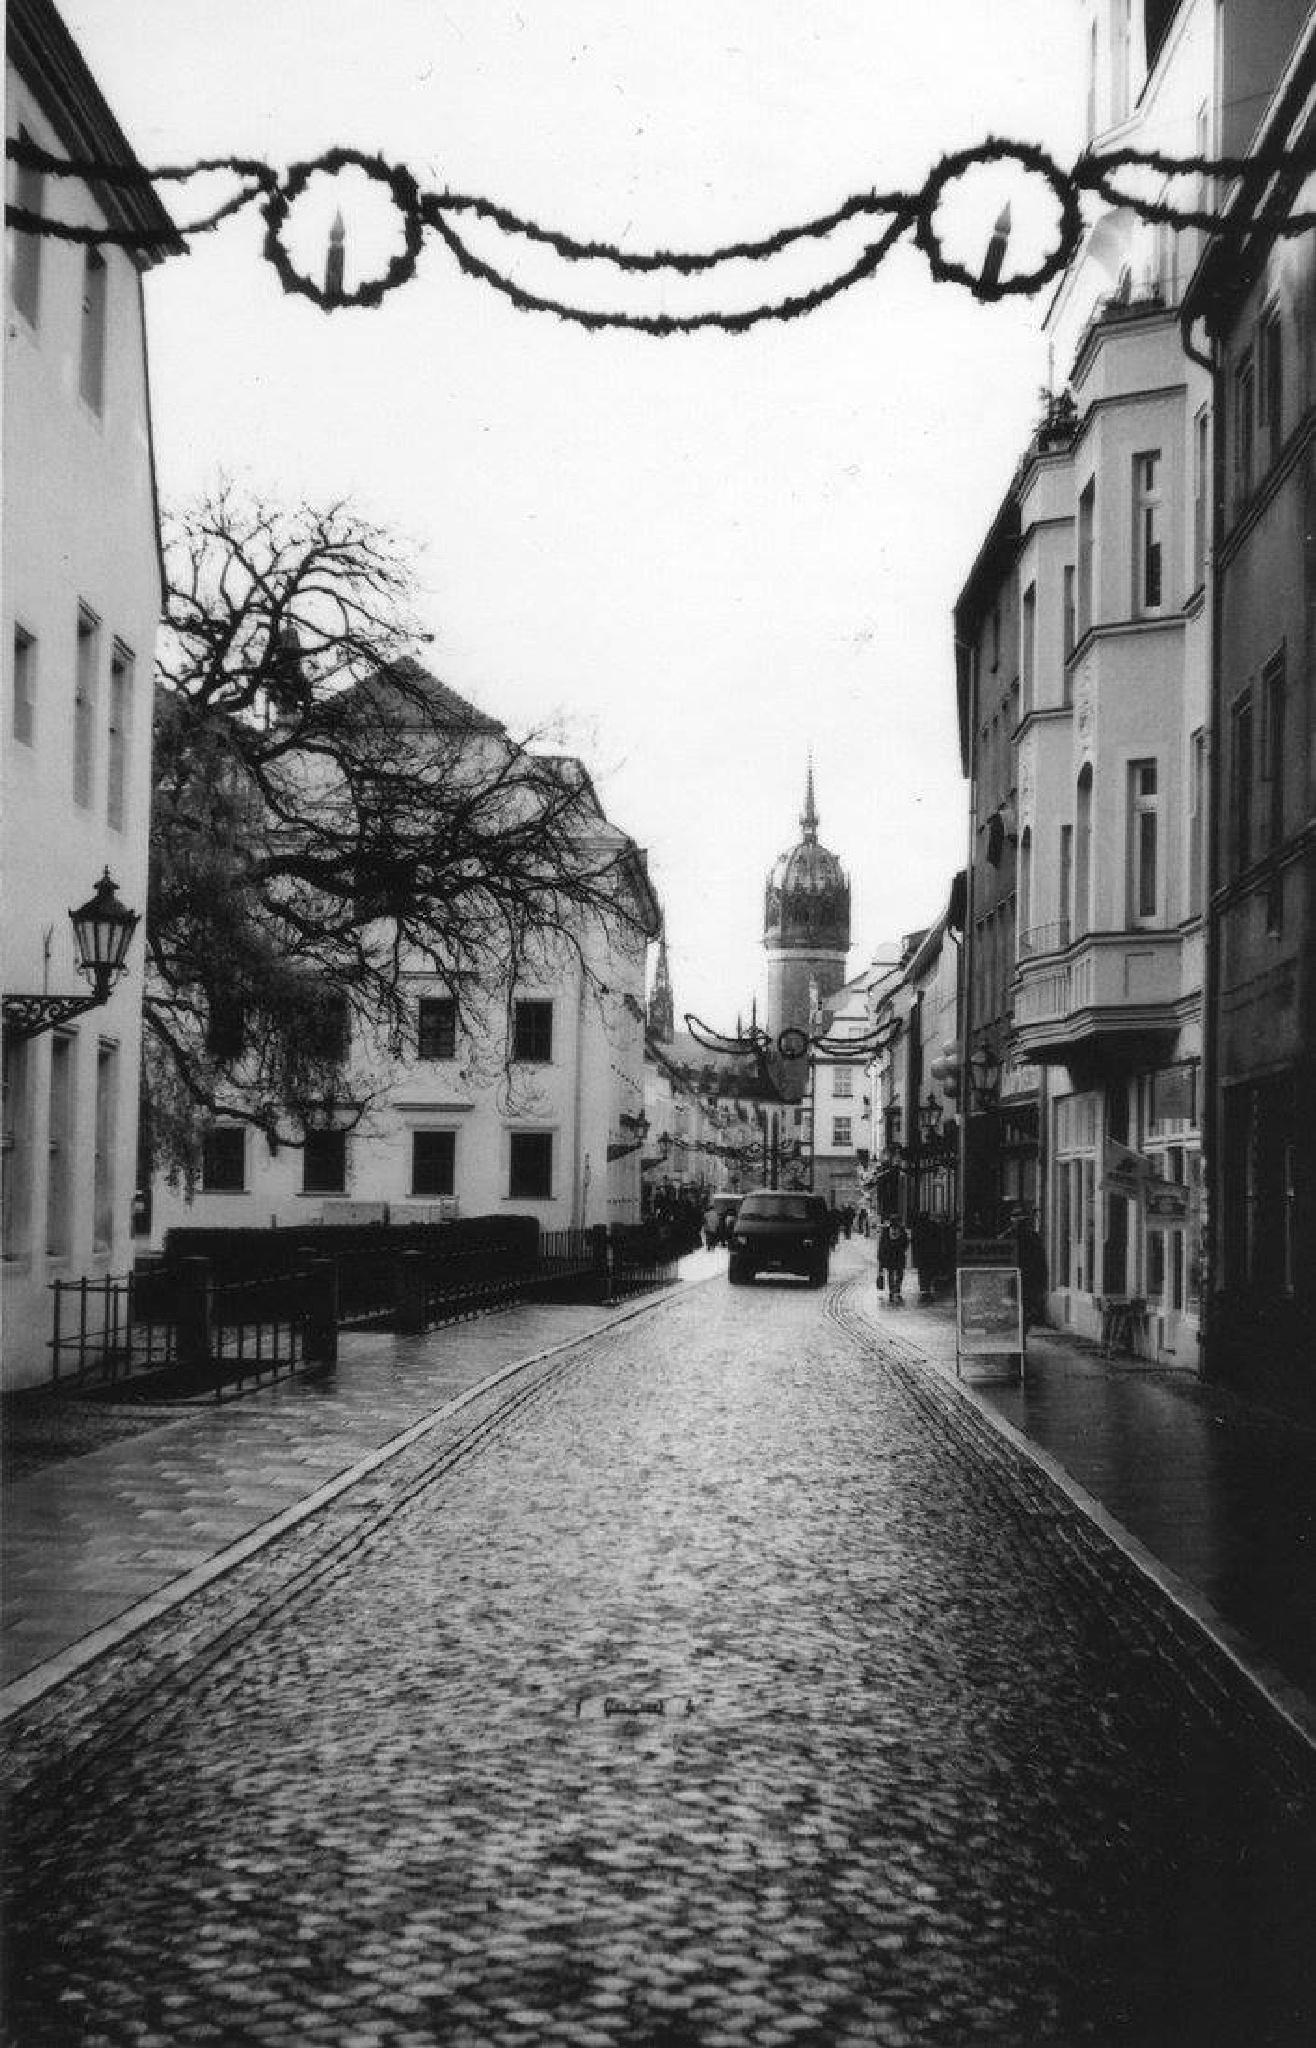 Wittenberg - Judenstrasse by filiplipinski1